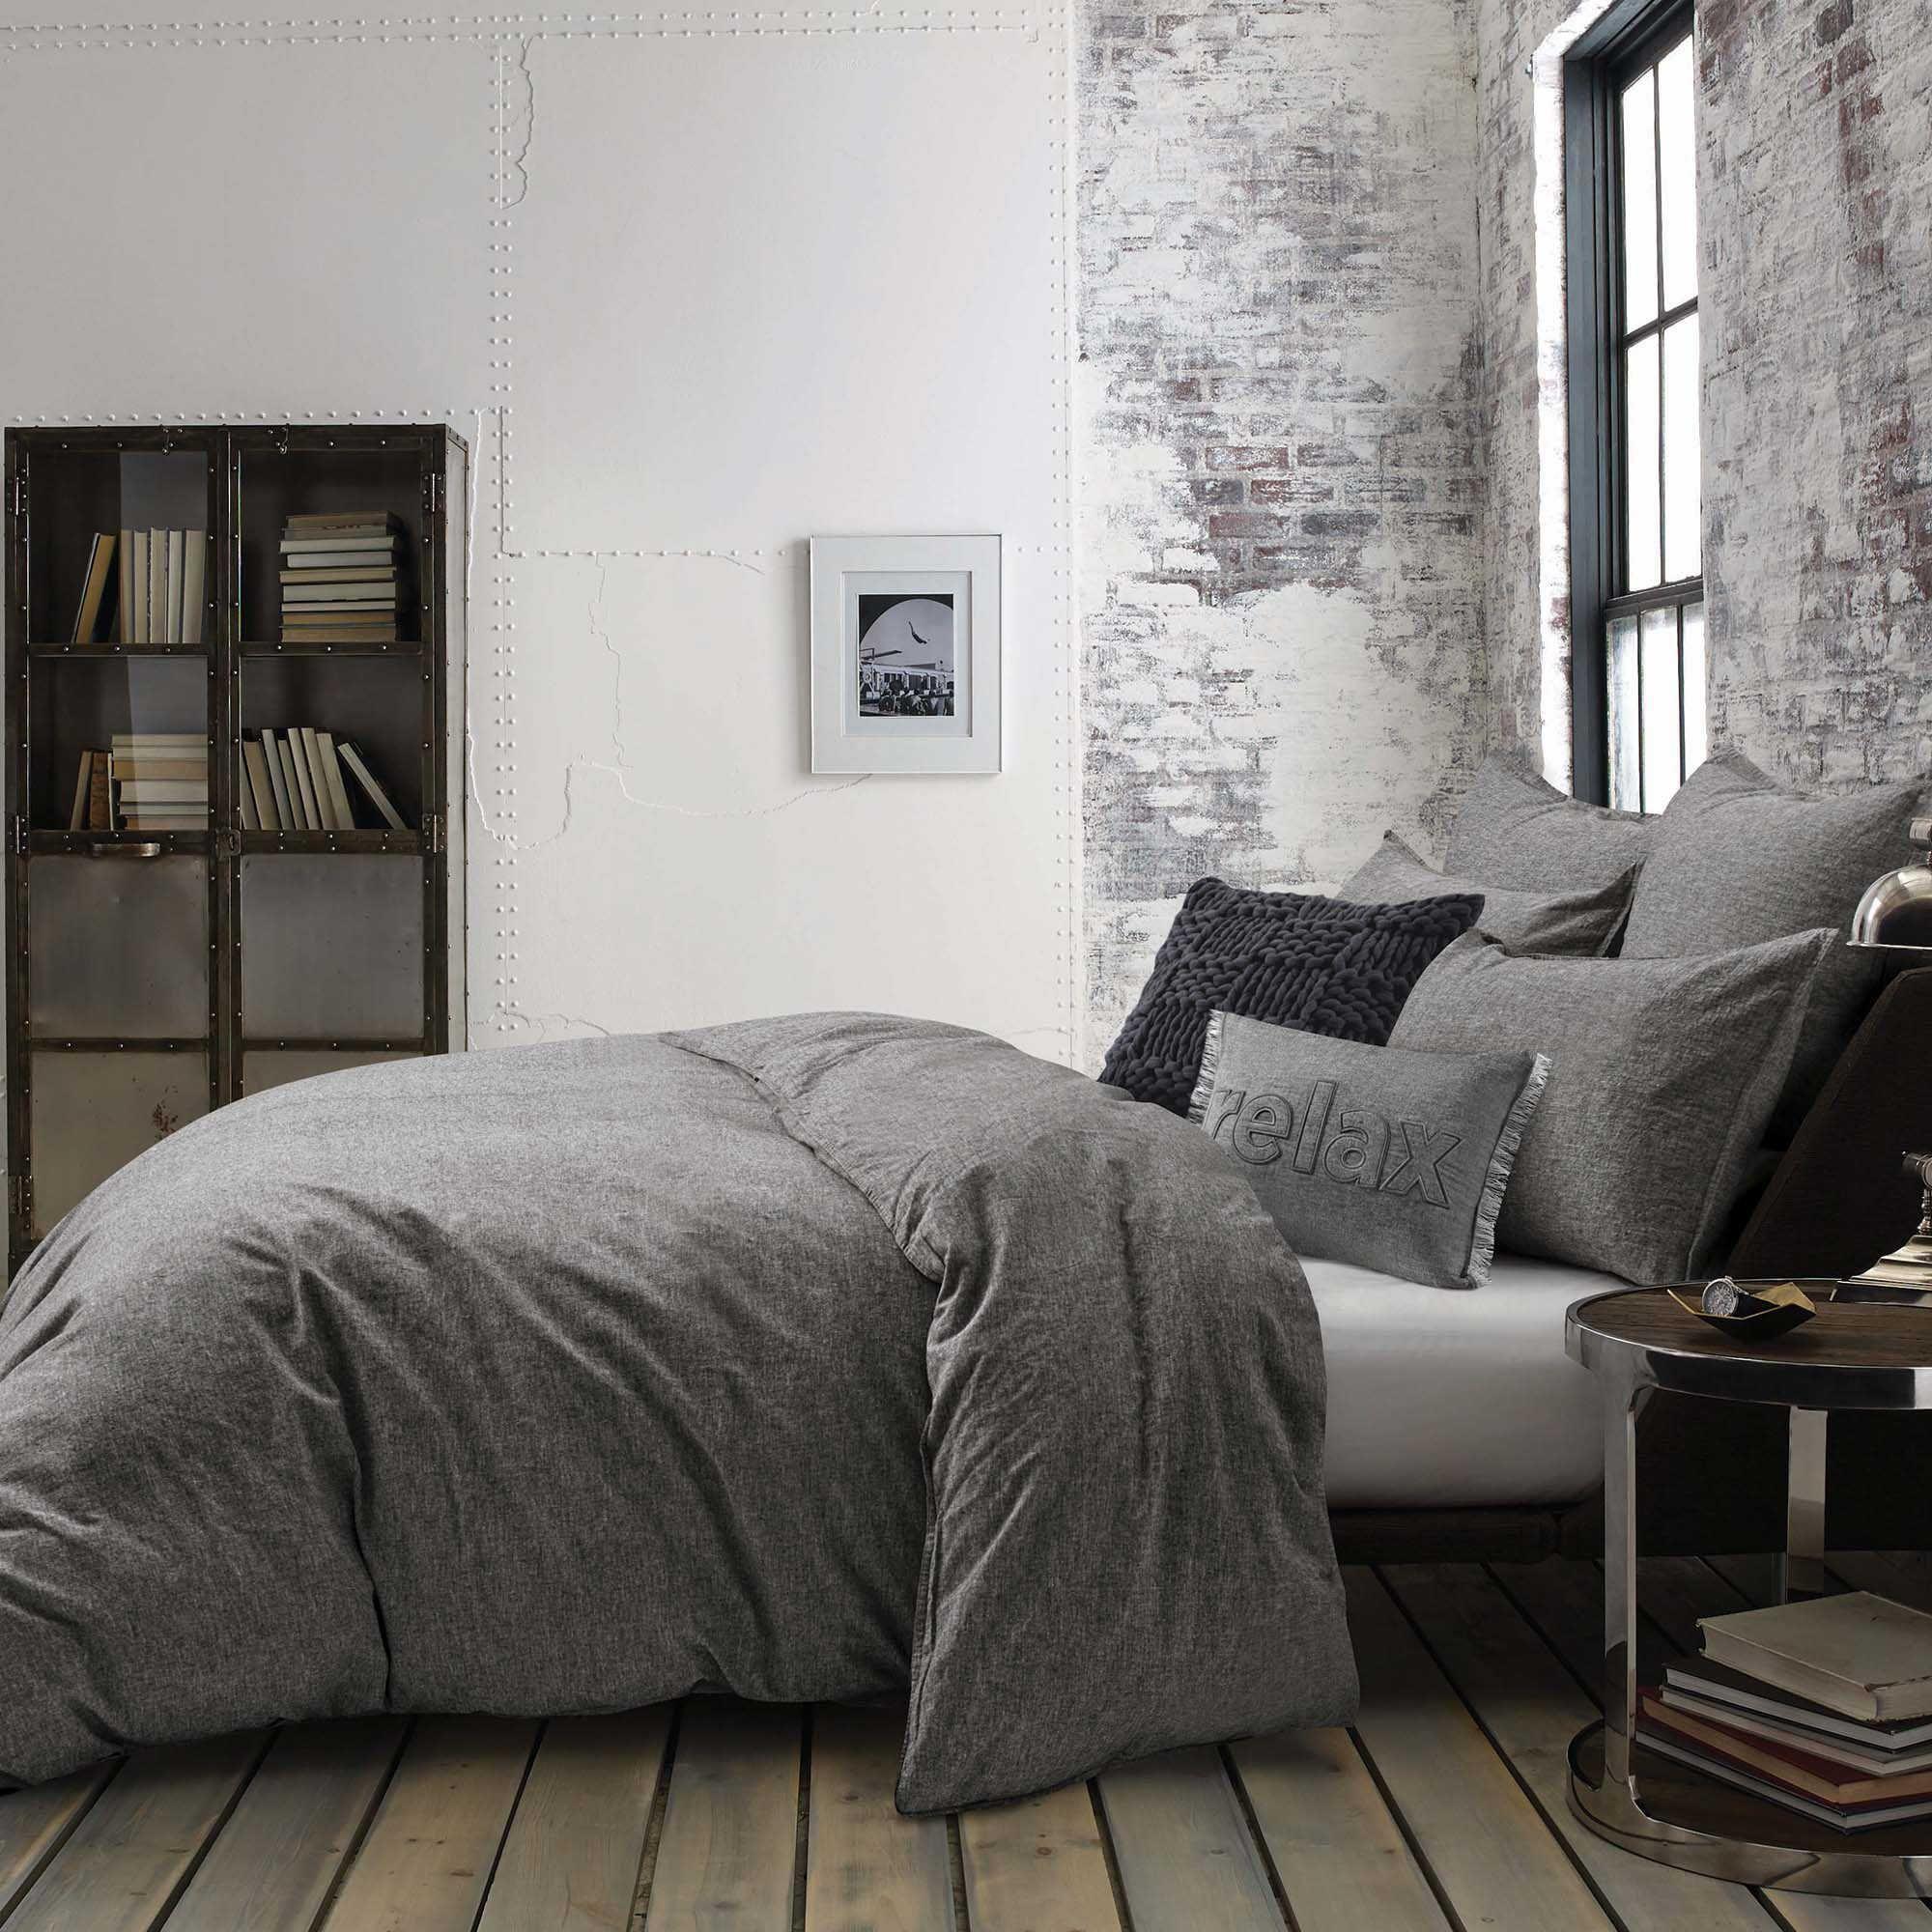 Kenneth Cole Mineral Yarn Dyed Comforter Set Bedroom Comforter